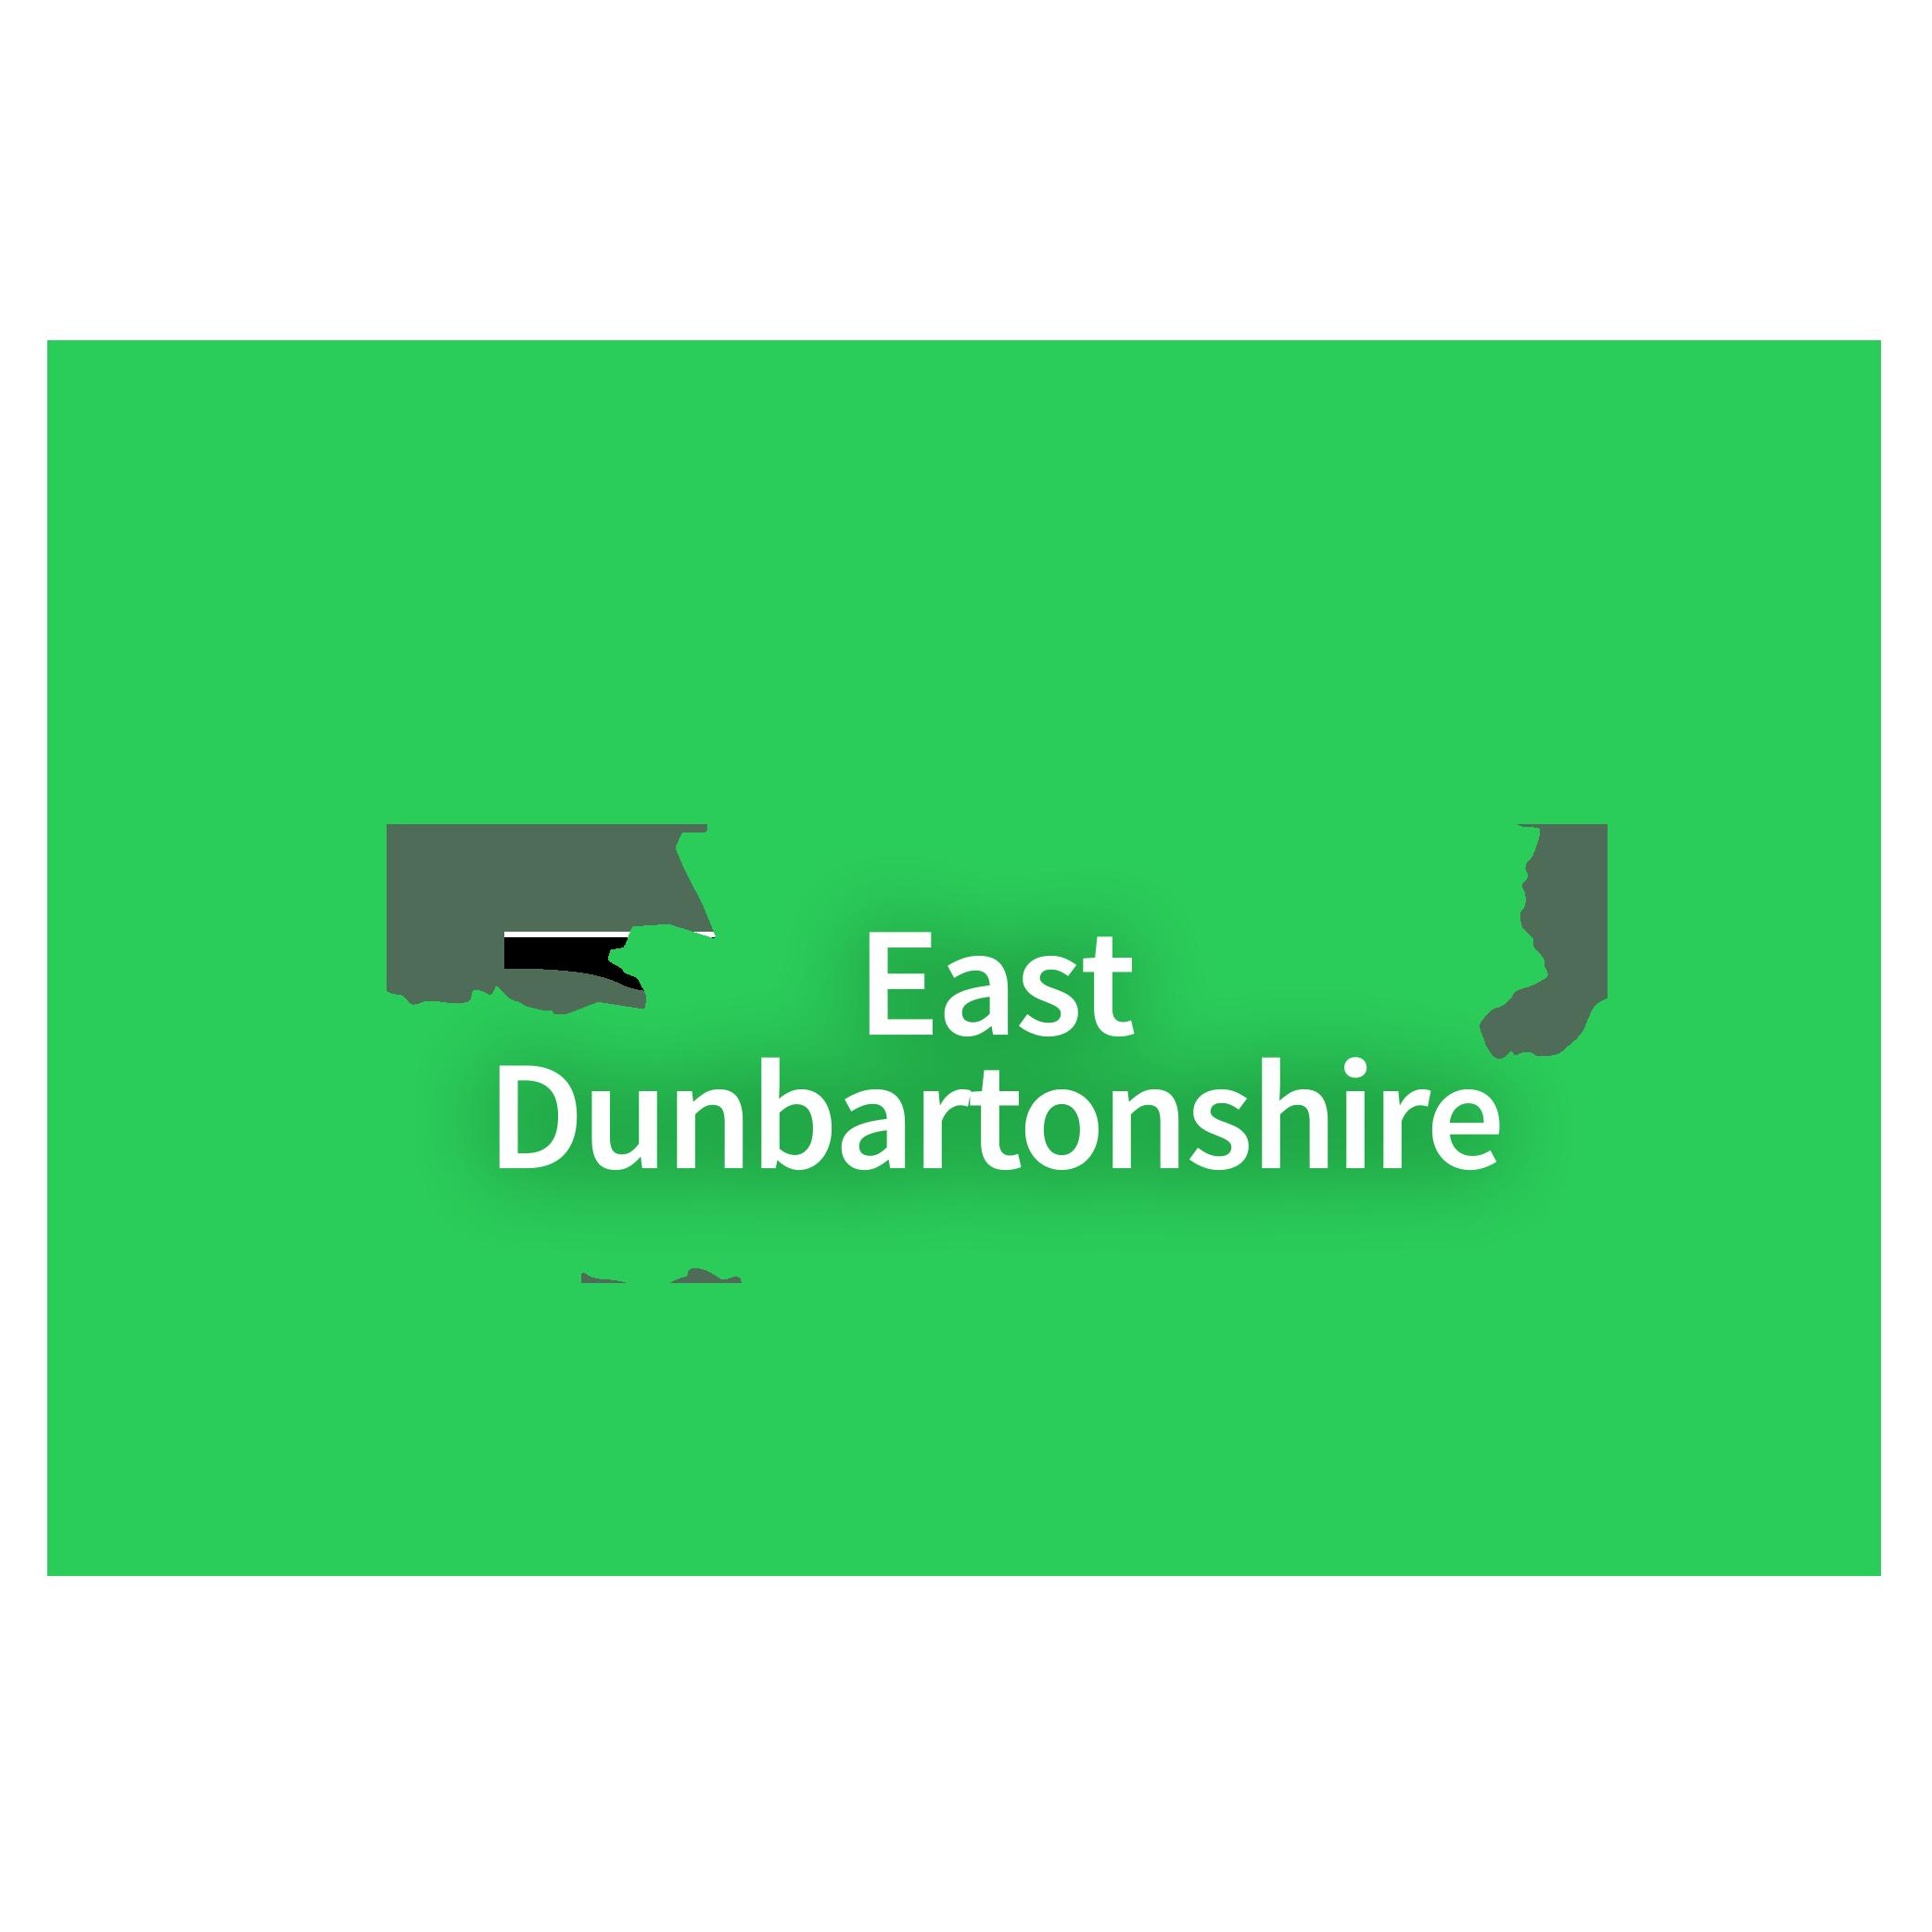 Map of East Dunbartonshire